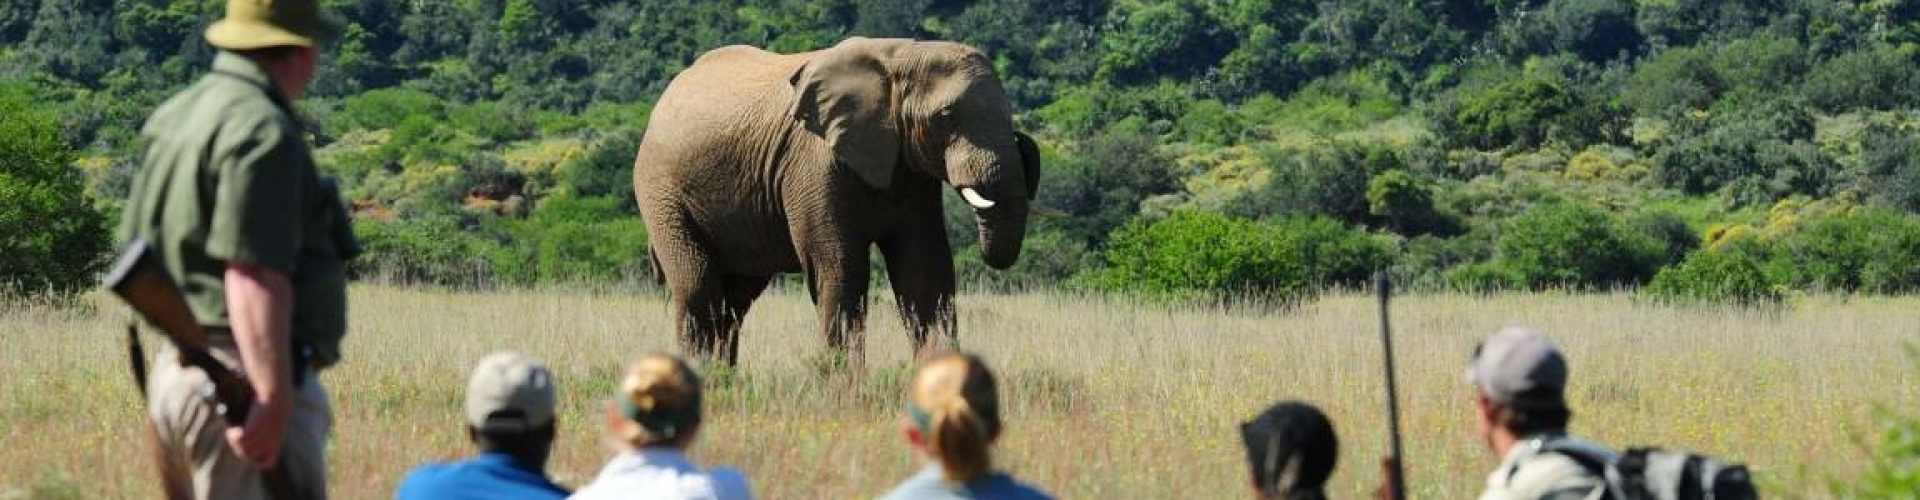 shamwari-game-reserve-walking-safari-elephant